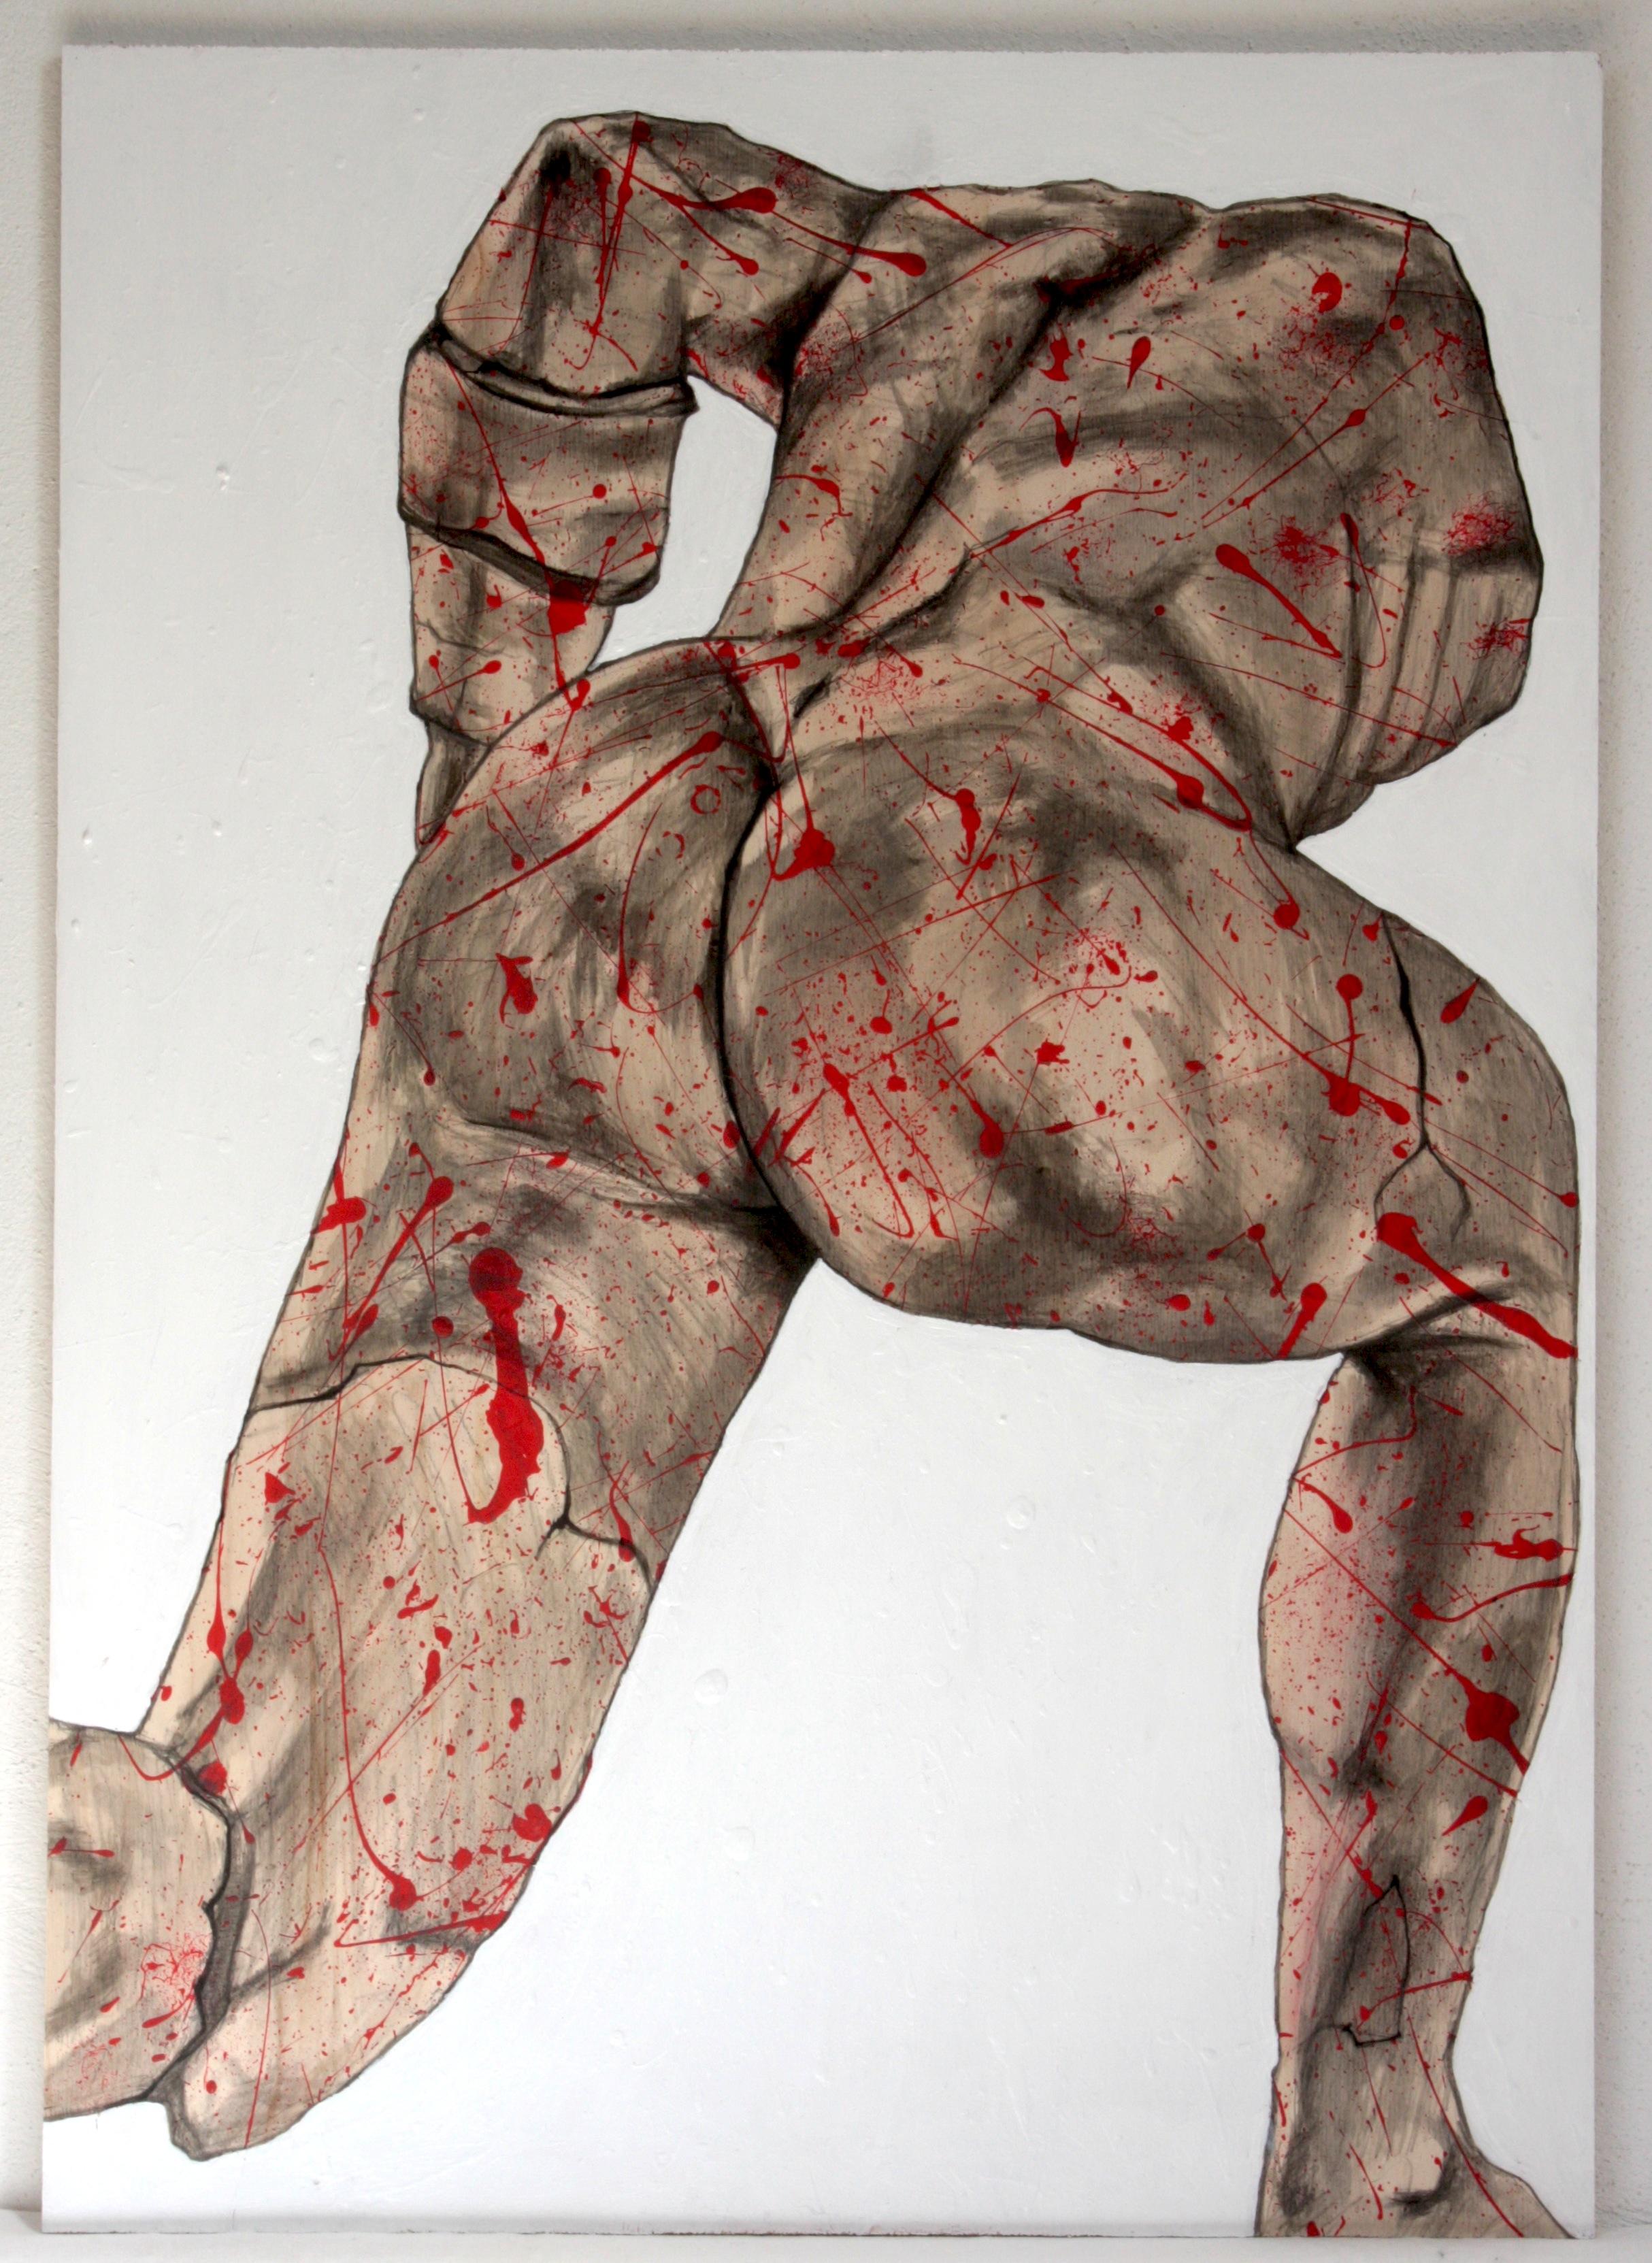 Pollock'd While Running Away